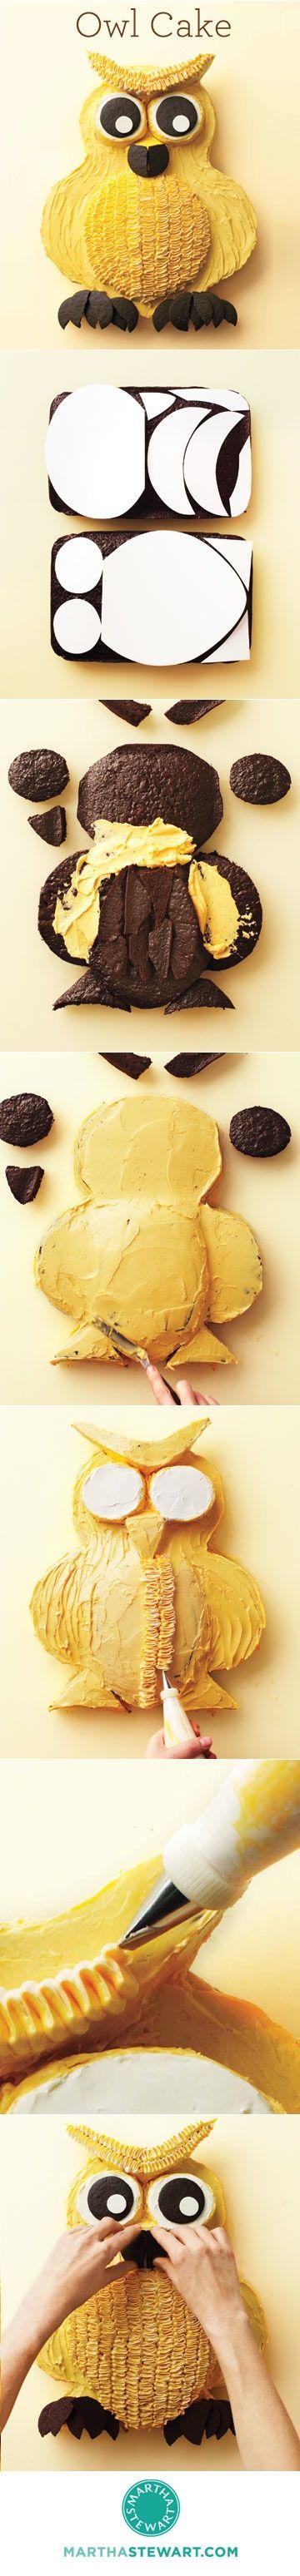 Owl Cake How-To Tutorial